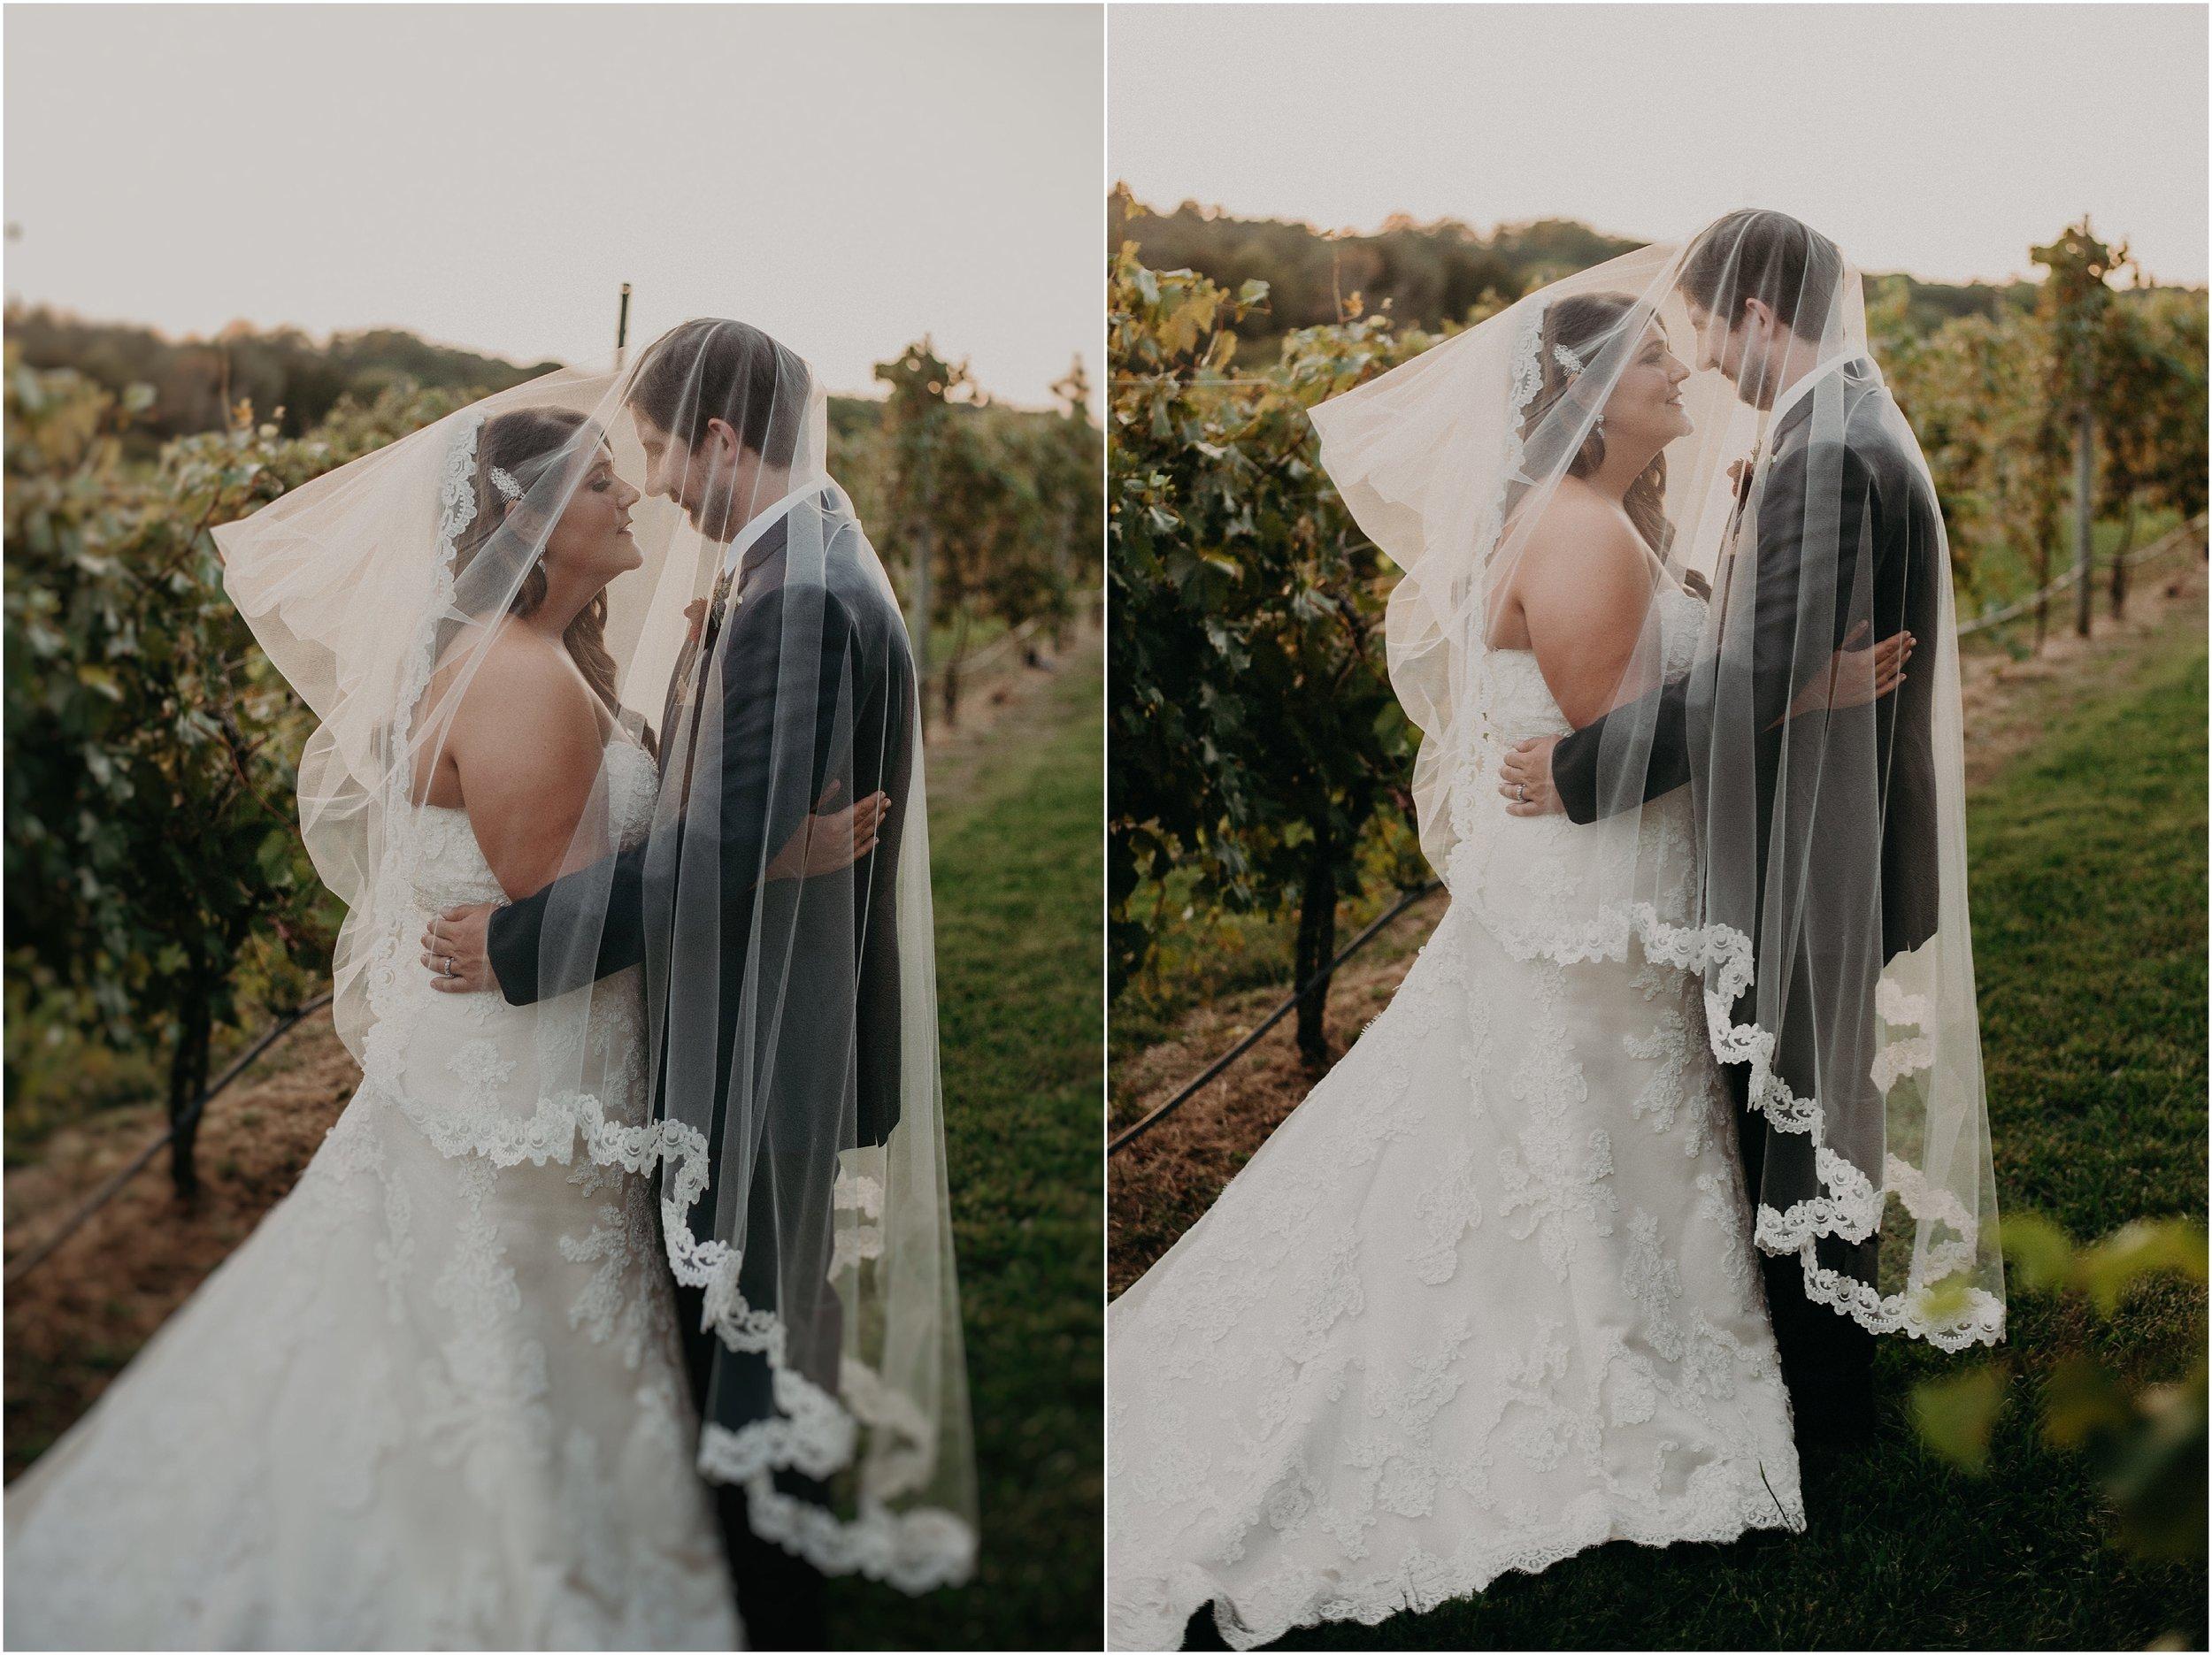 Wedding couple get cozy together beneath bride's cathedral veil